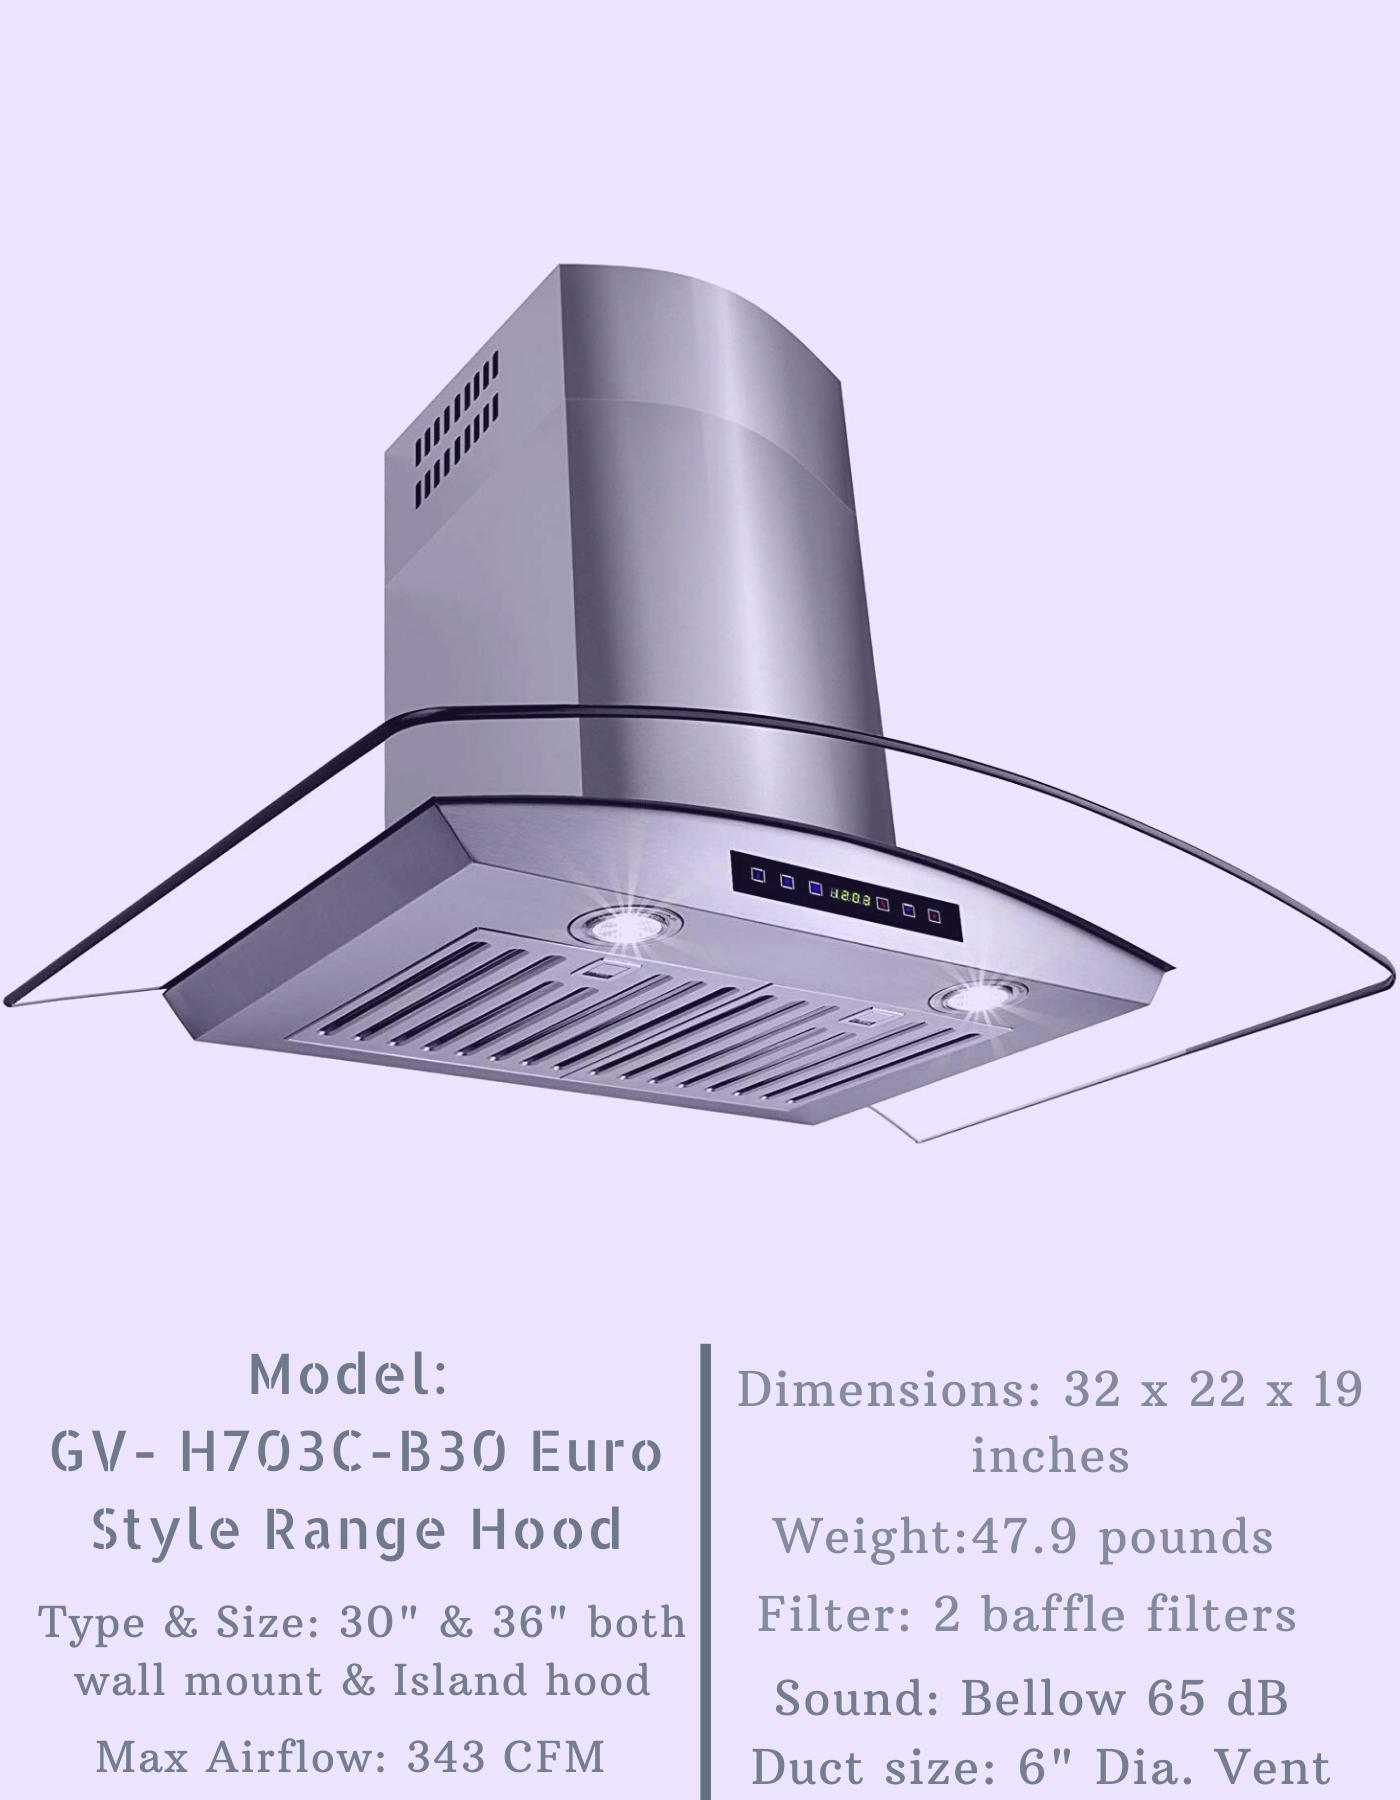 Golden Vantage H703c B30 Euro Style Range Hood In 2020 Range Hood Reviews Range Hoods Euro Style